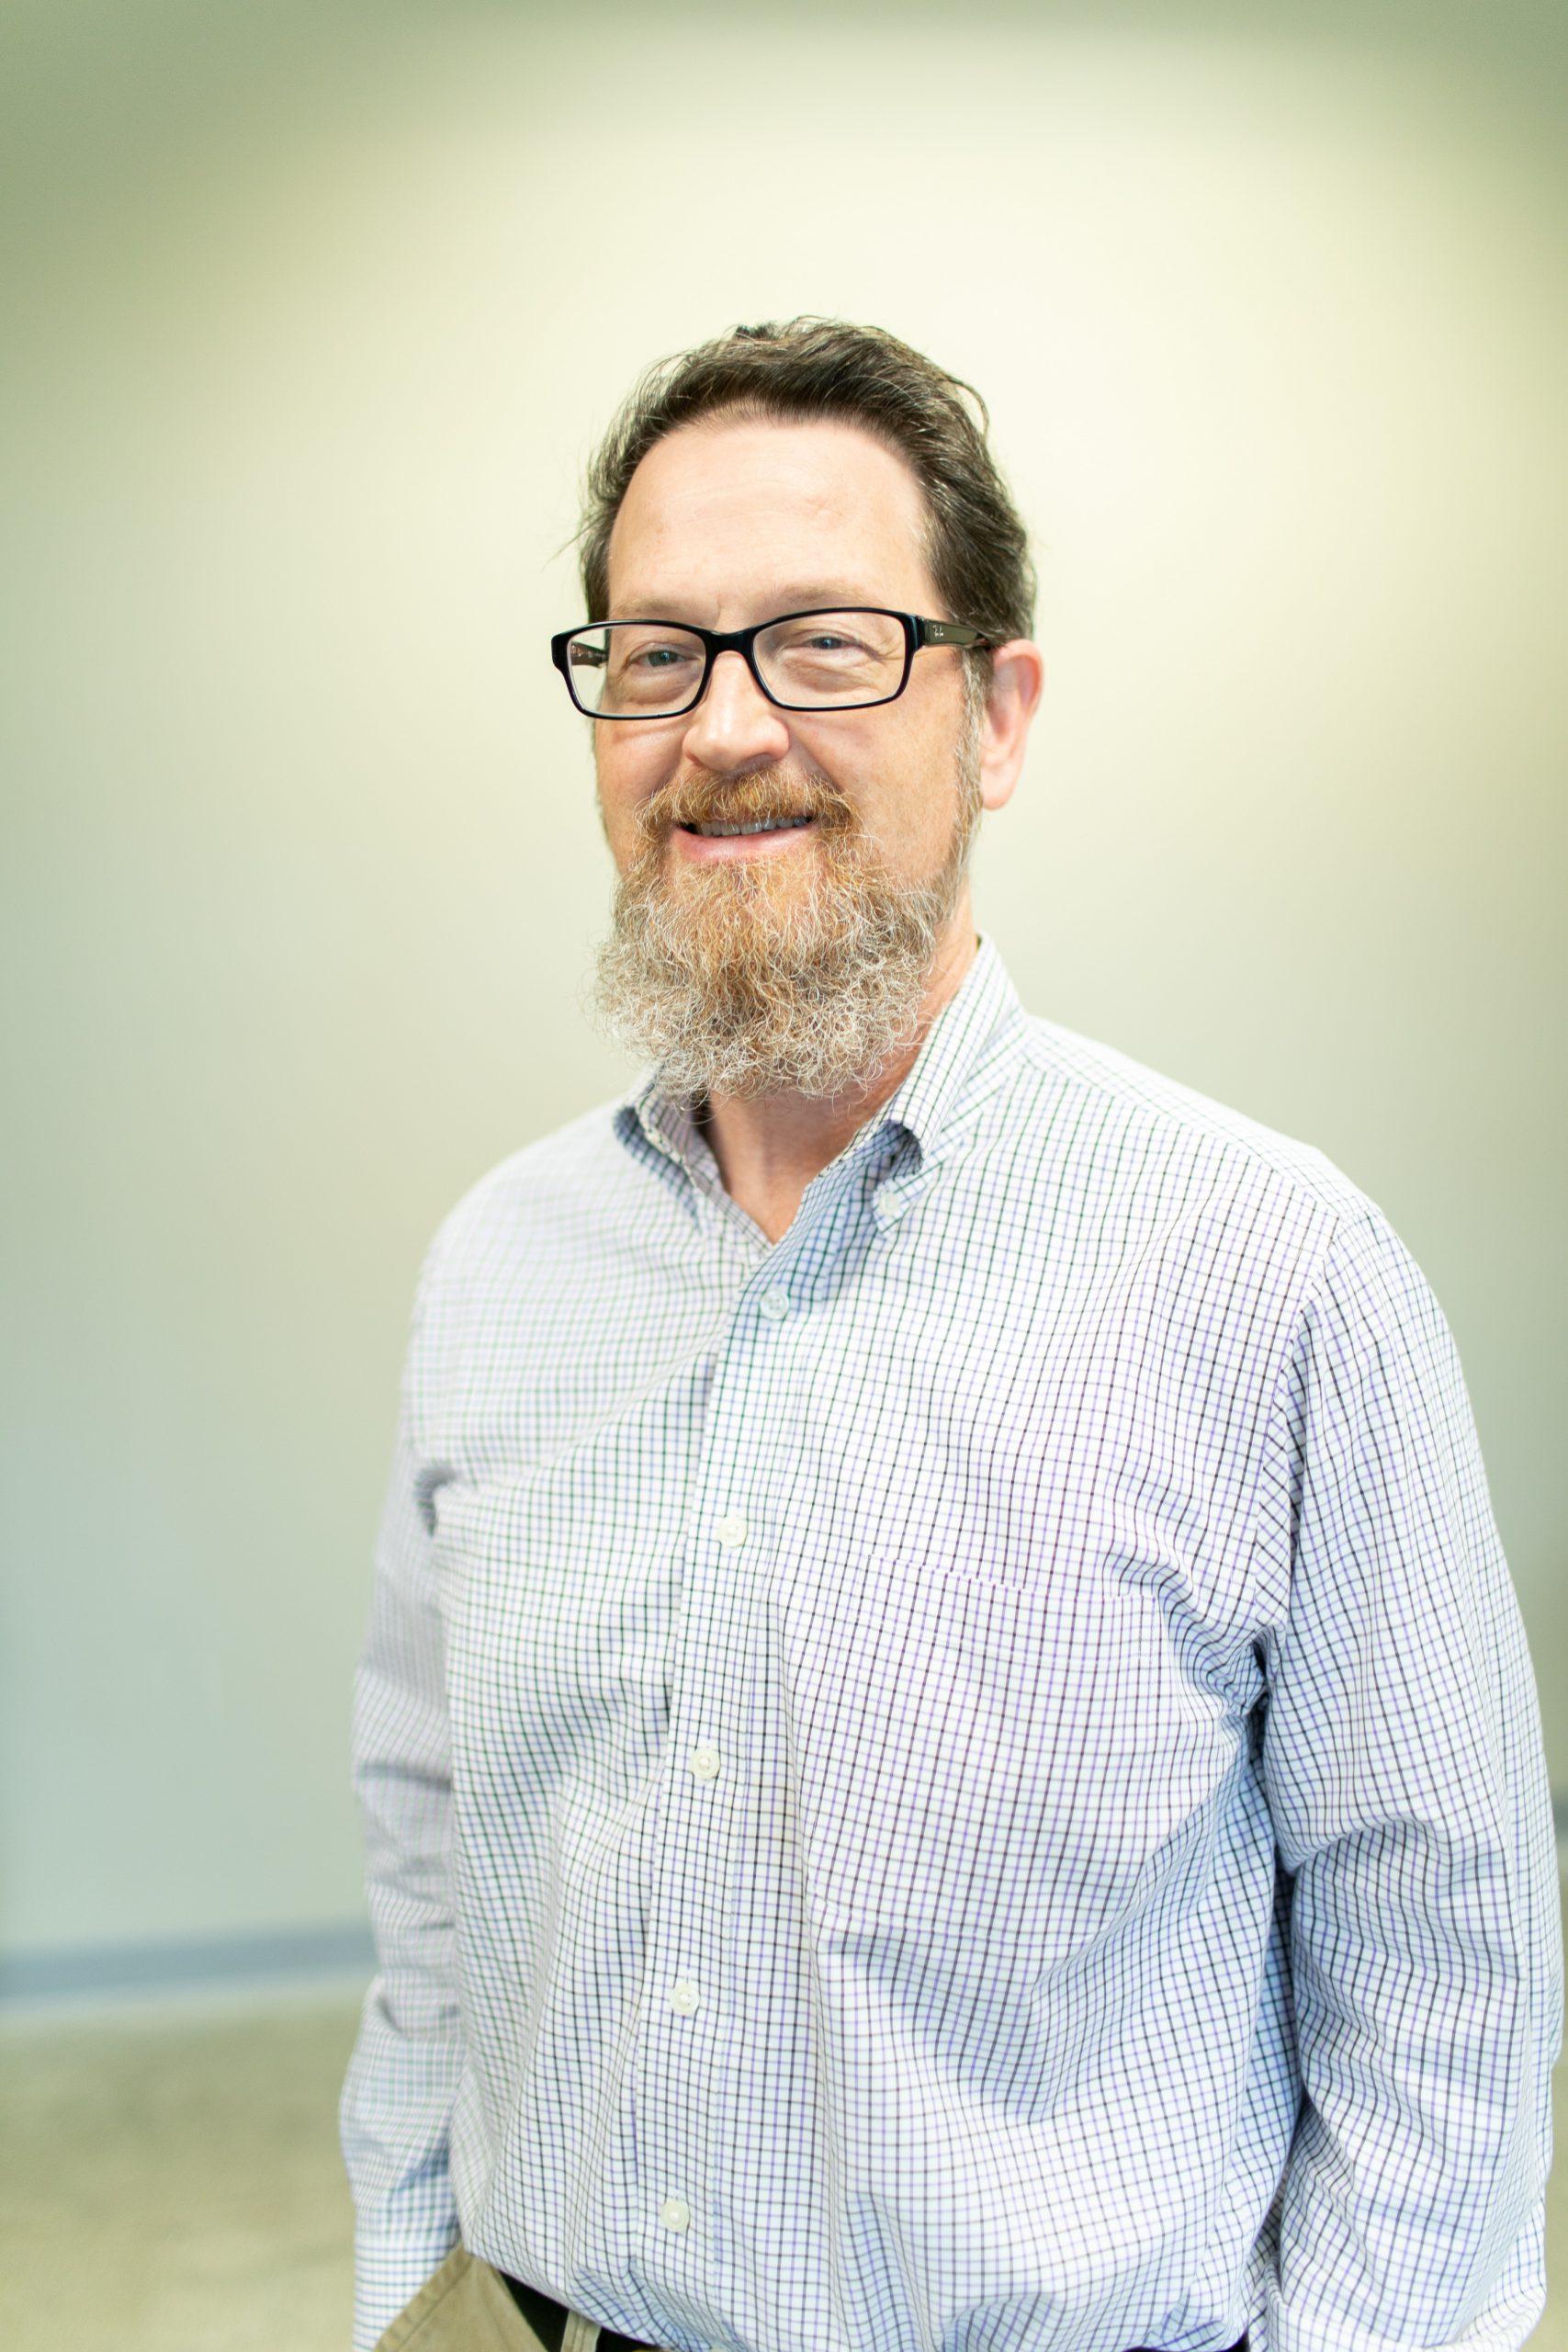 Kevin Lemke - VP of Information Technology, LI Group LLC